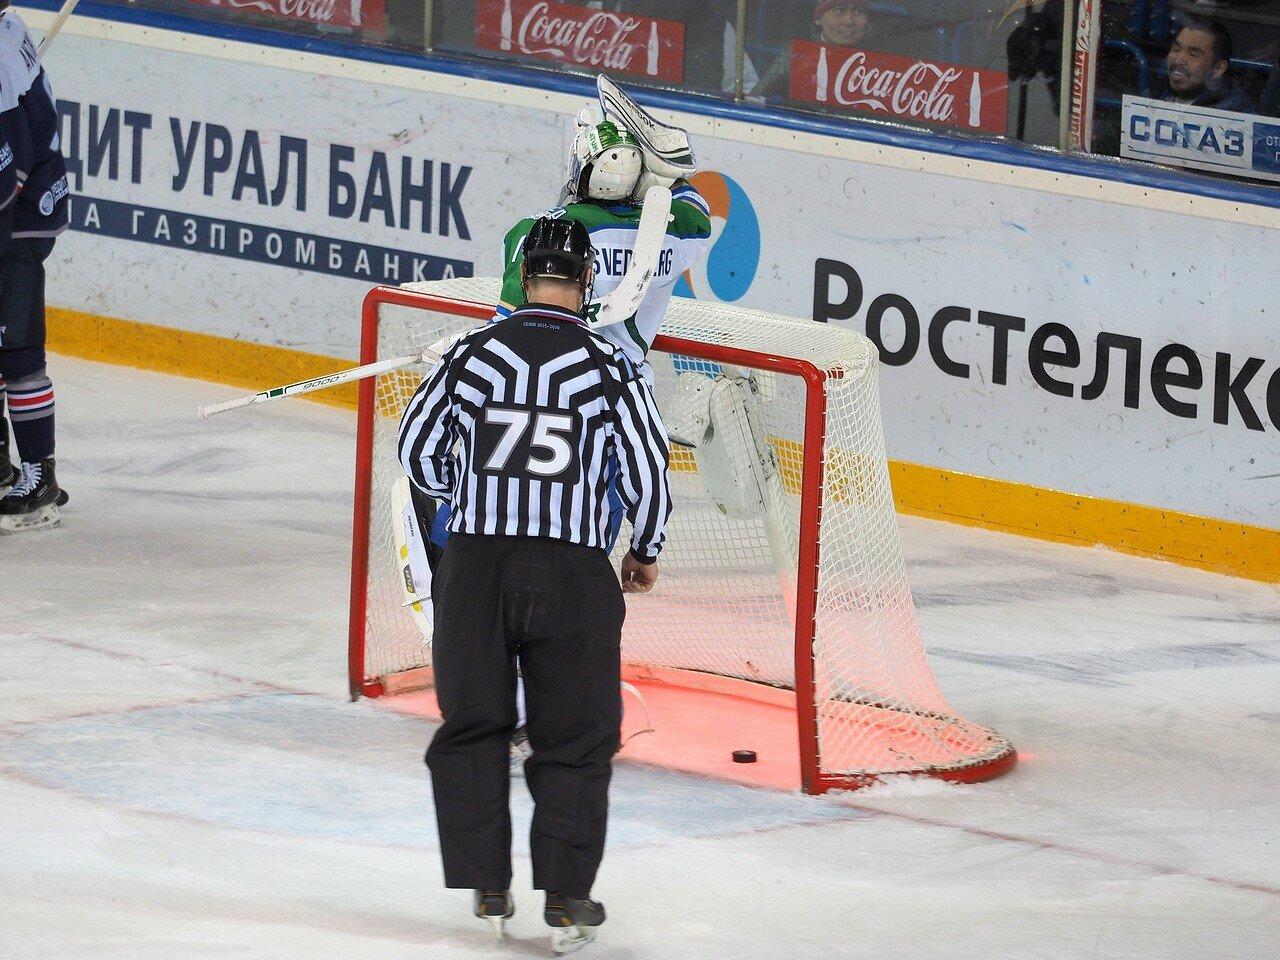 108Плей-офф 2016 Восток Финал Металлург - Салават Юлаев 23.03.2016